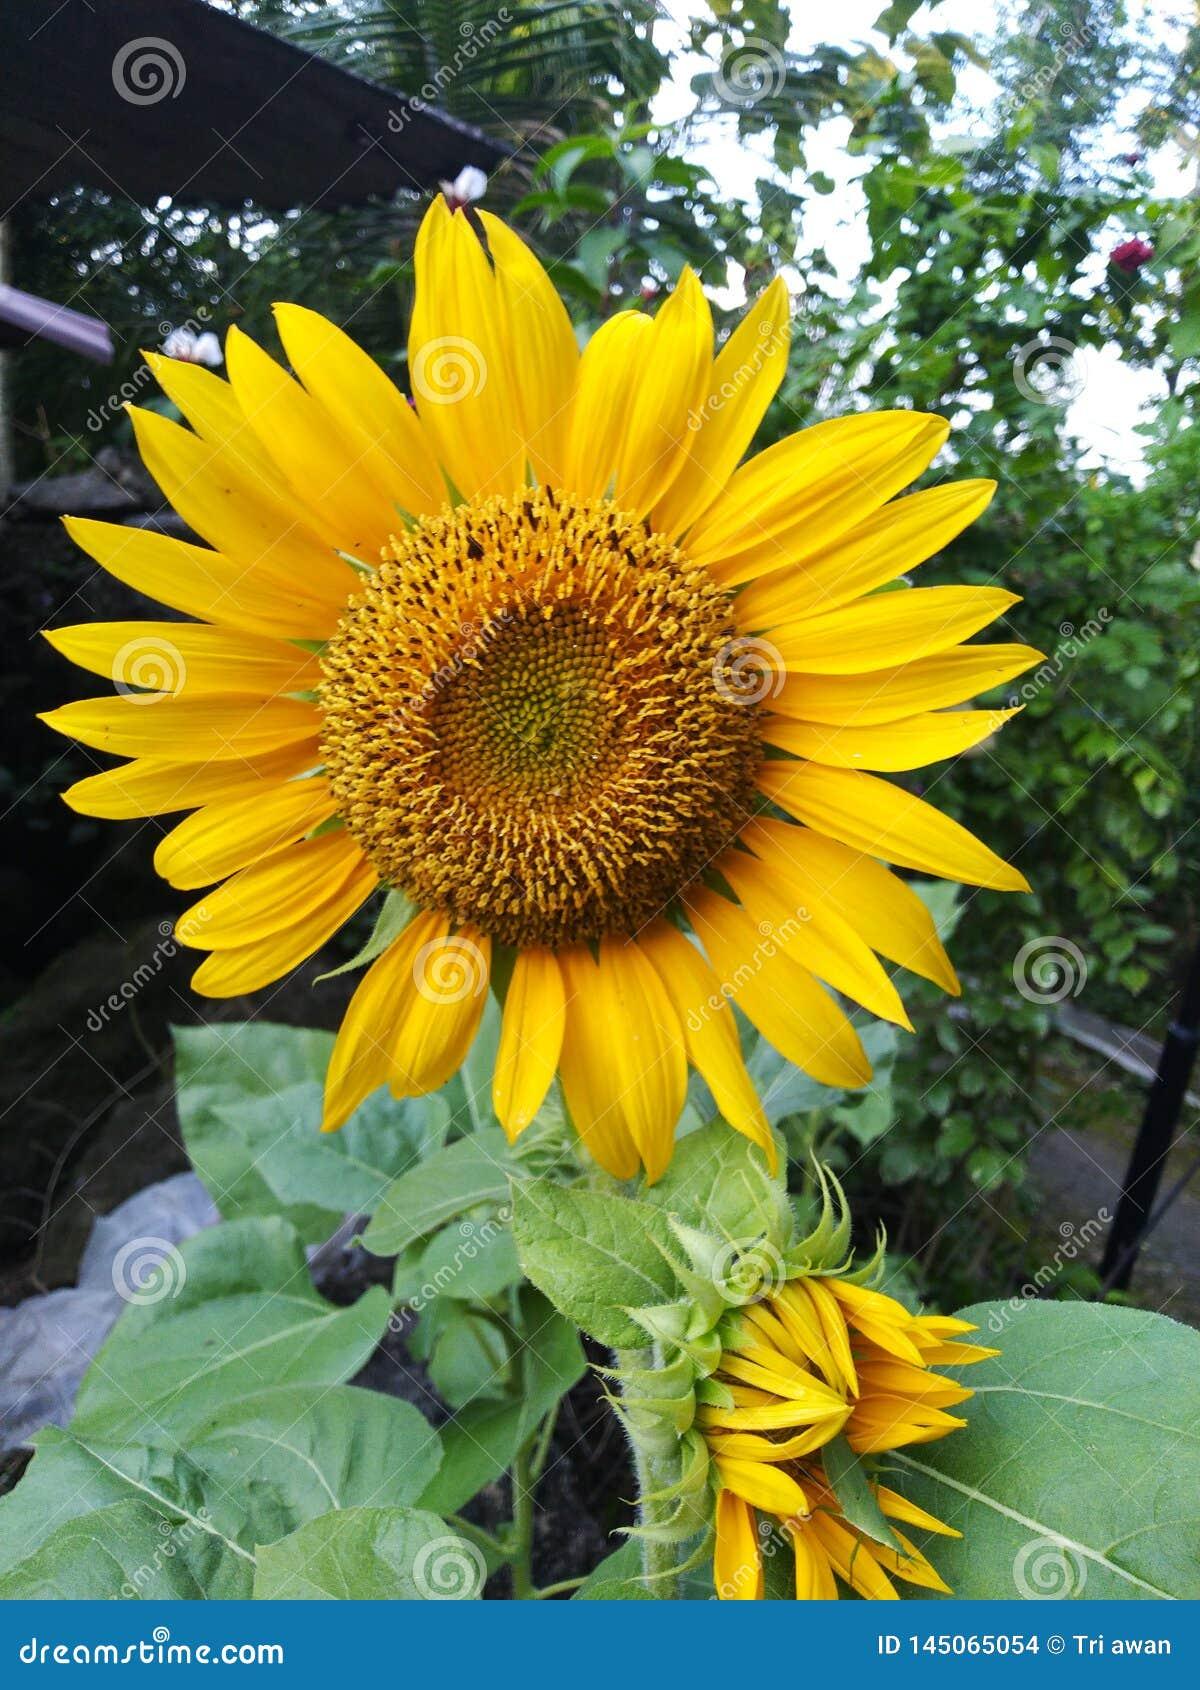 beauty sunflowers